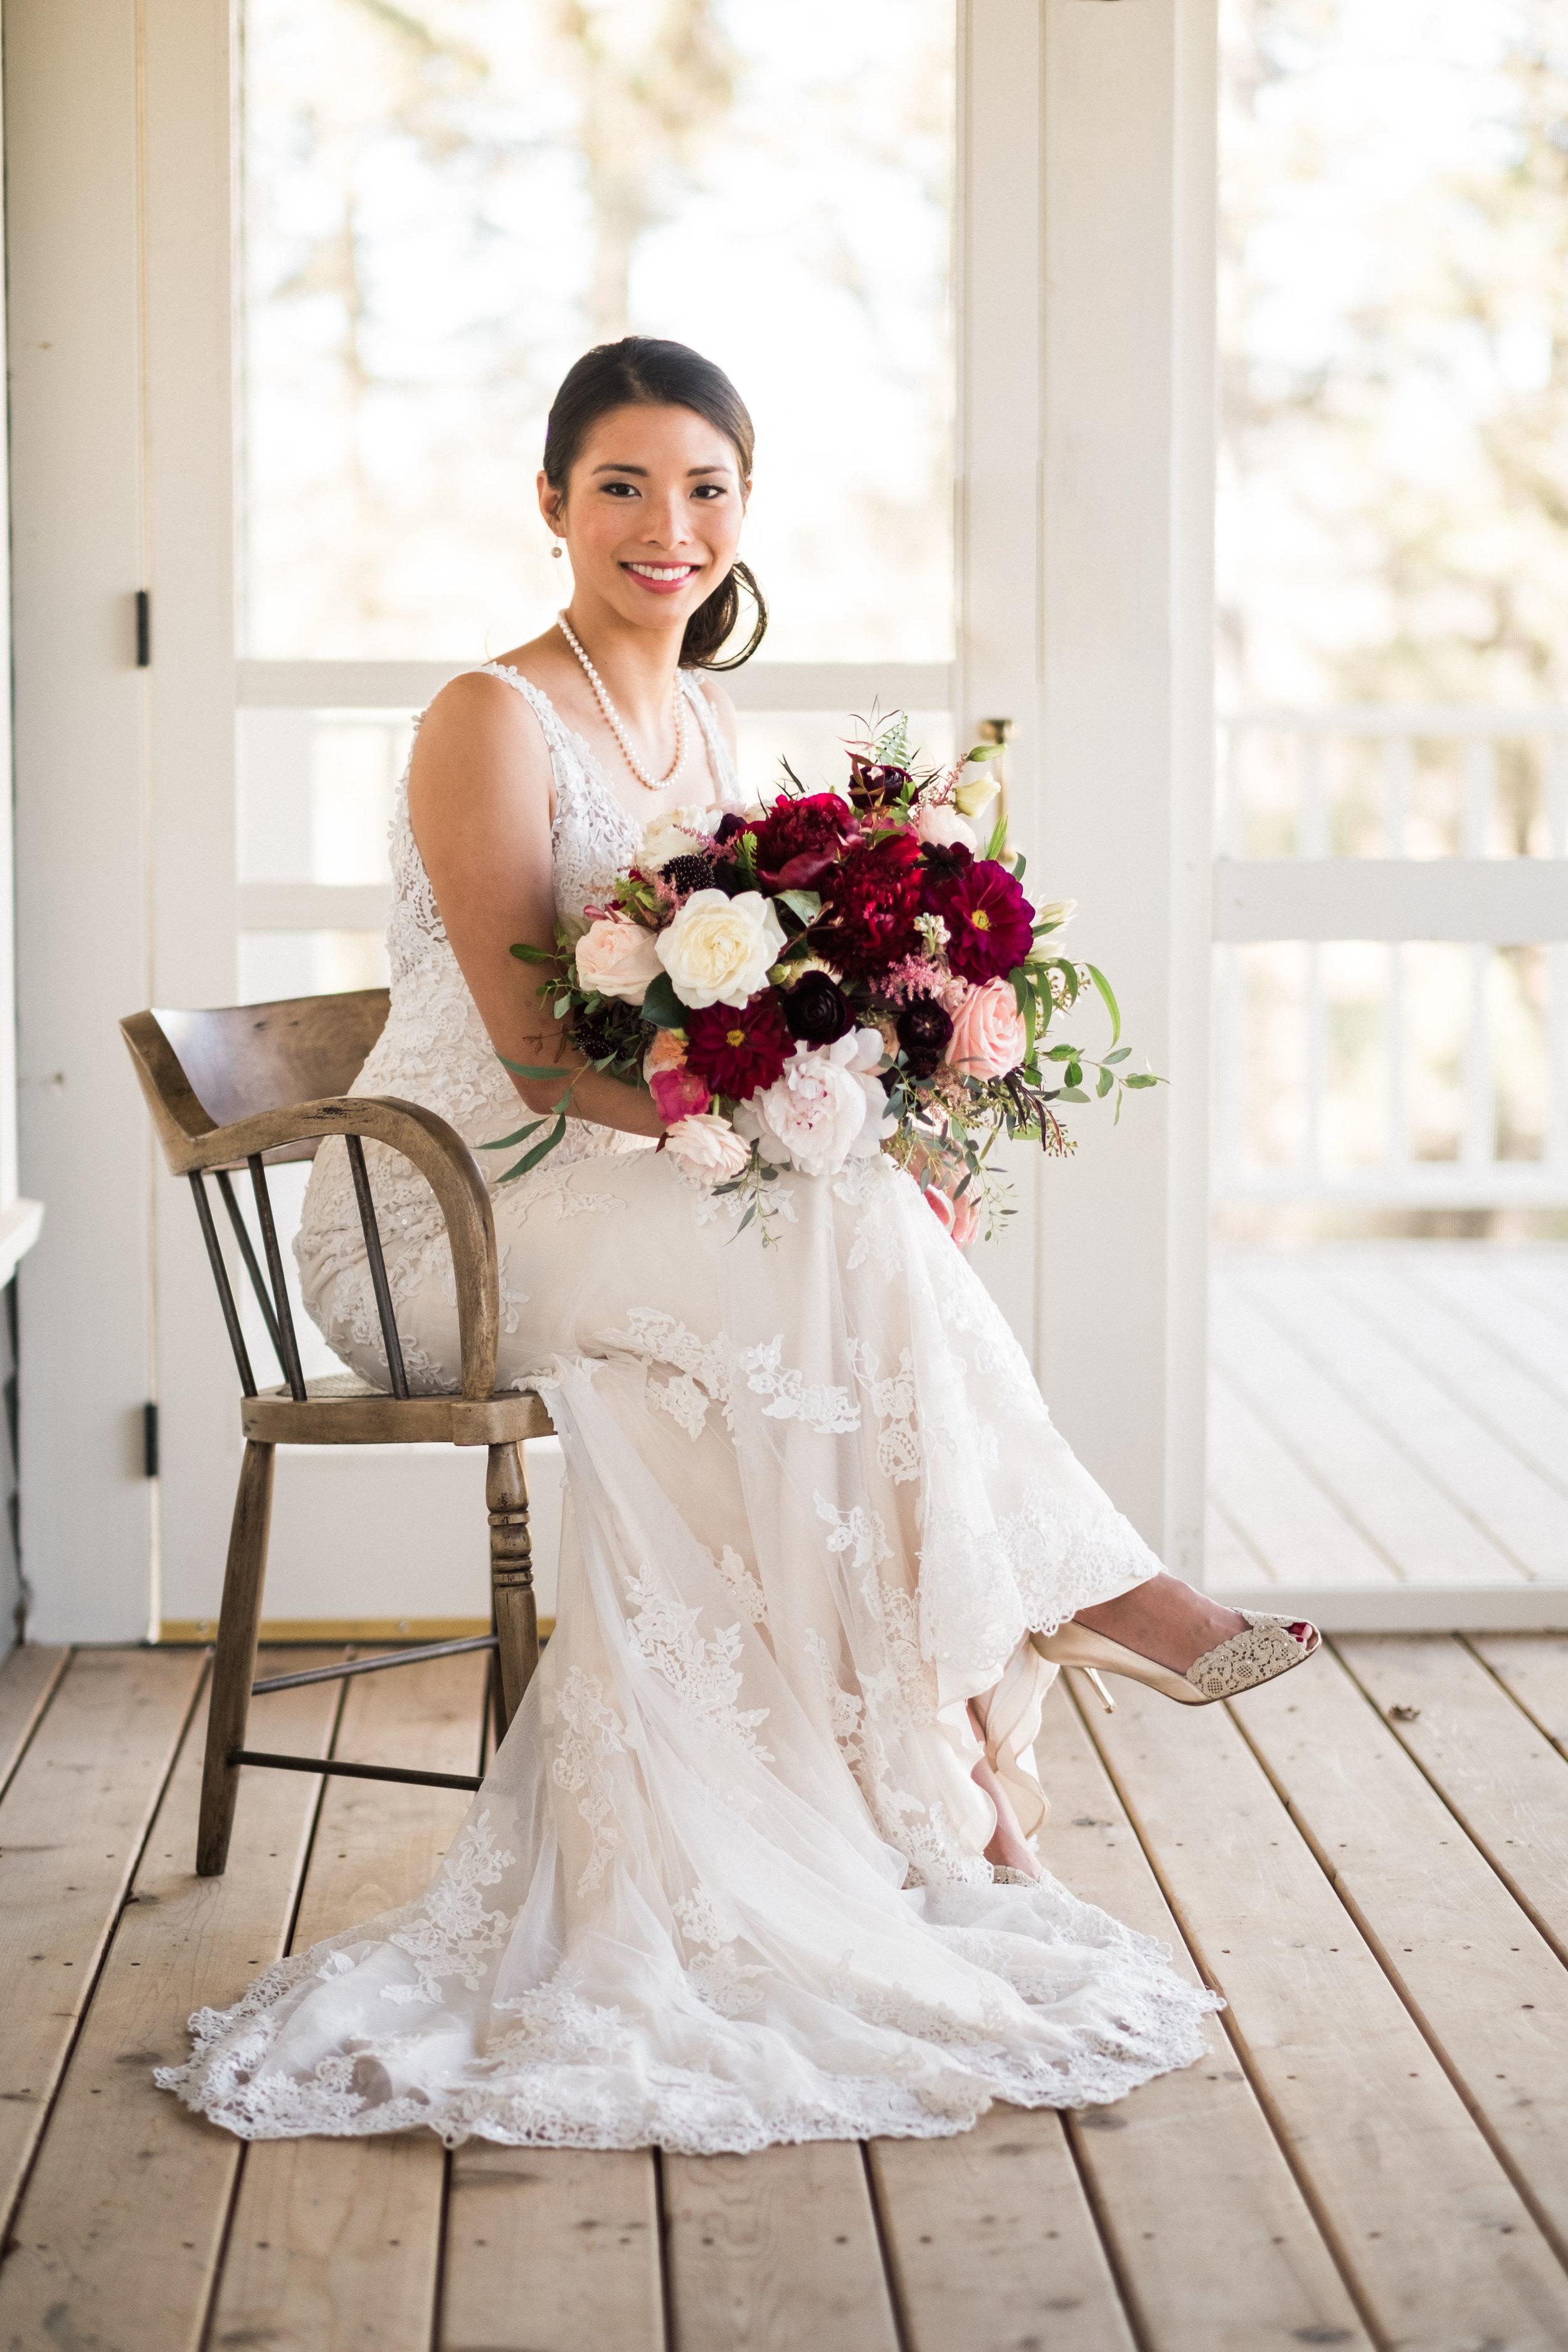 portraits of the bride brainerd wedding photographer